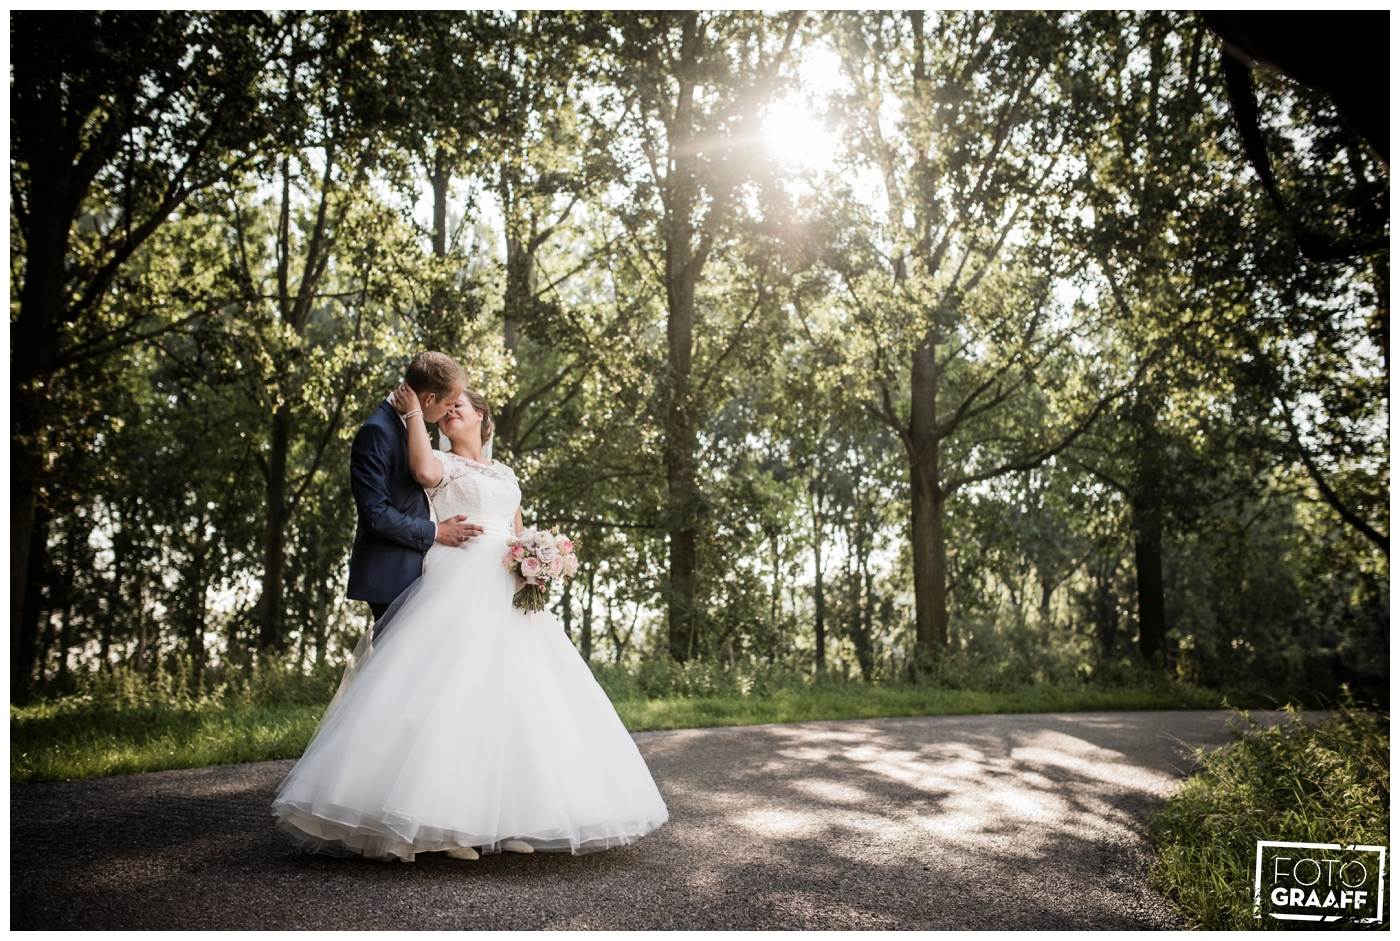 bruidsfotografie in Oud beijerland Richard & Rianne_1492